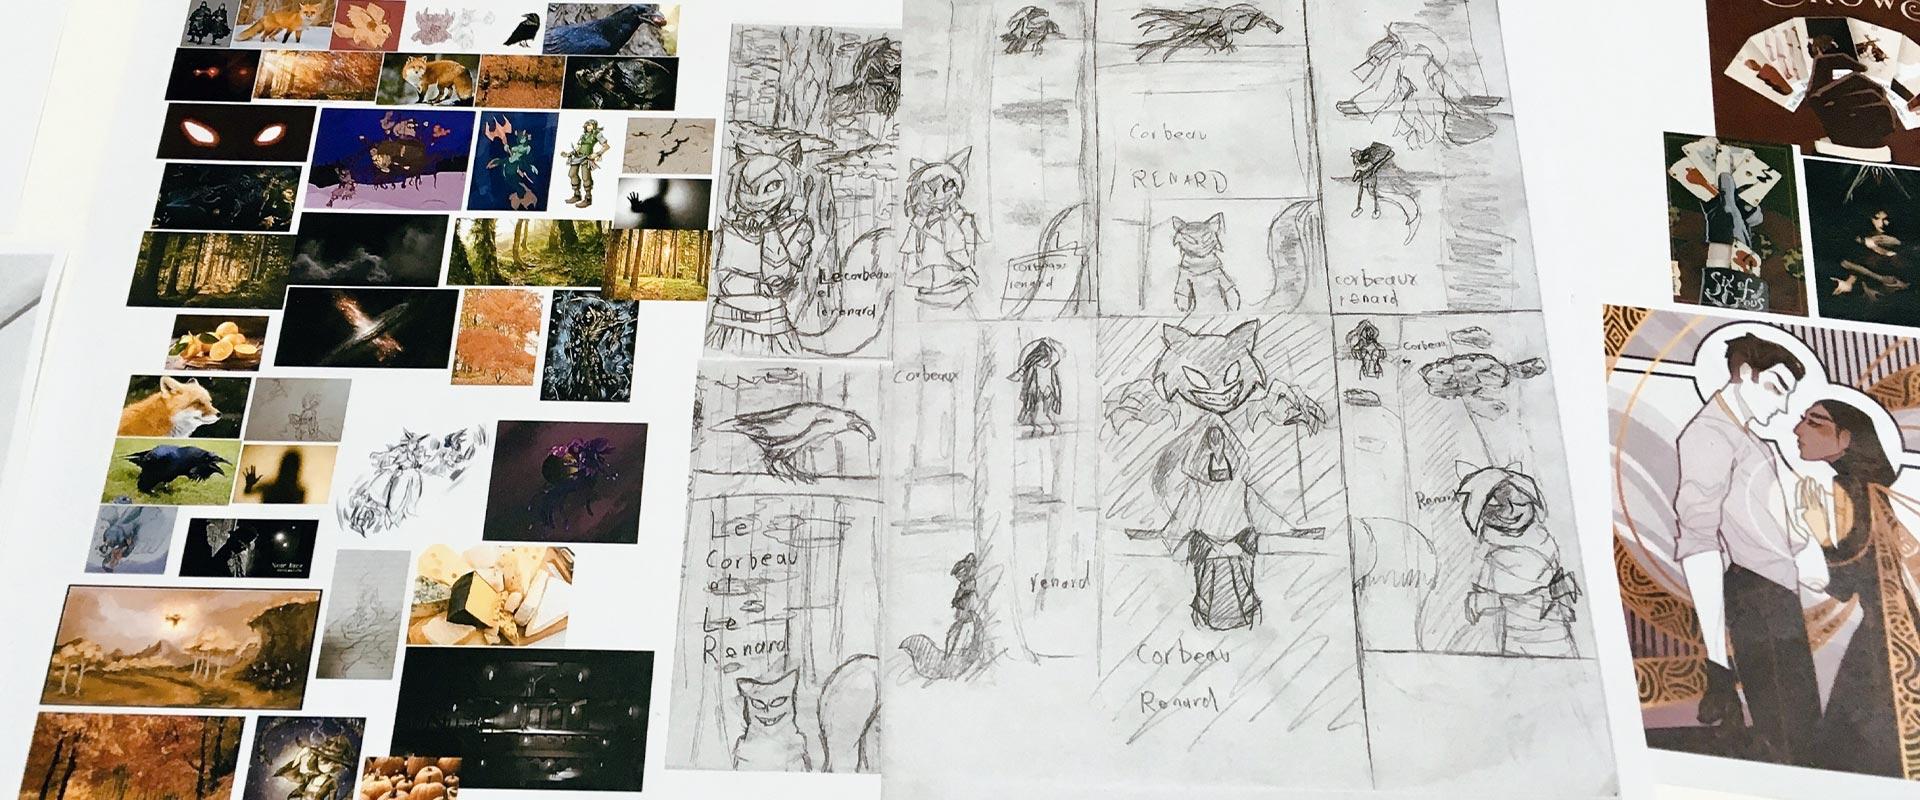 tarifs financement école bd manga illustration peinture game art dev prog